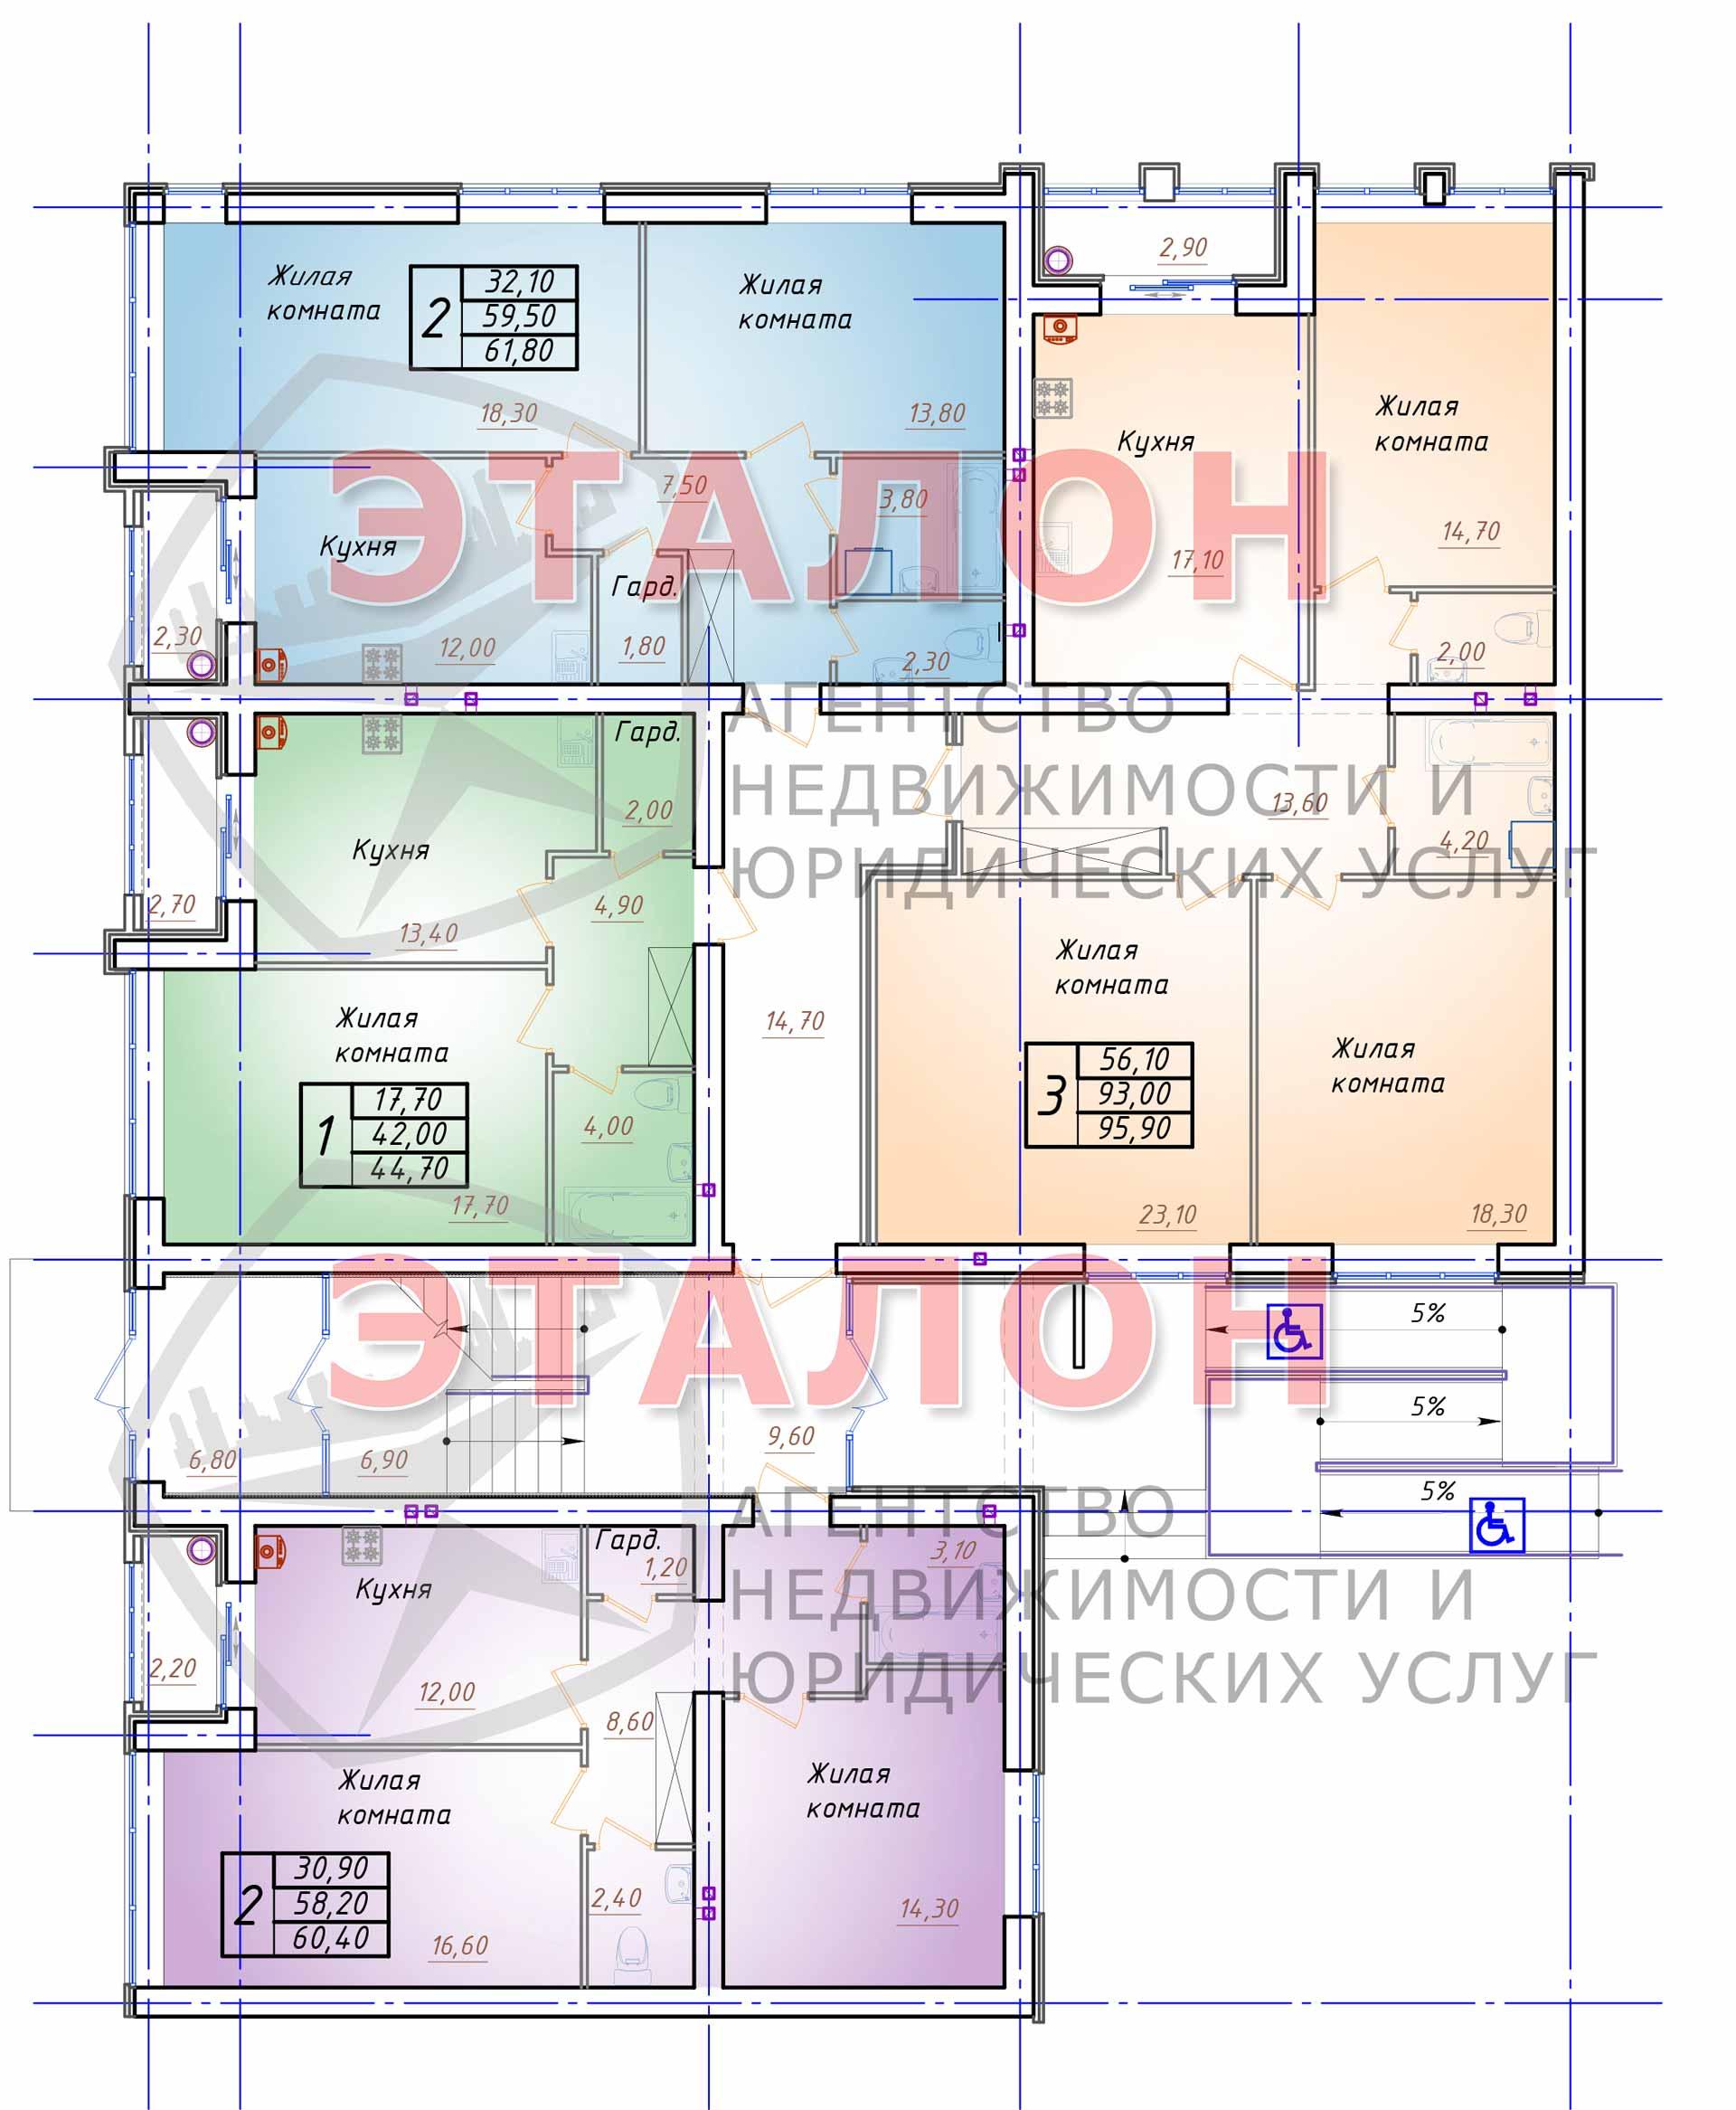 Блок 3. Подъезд 3. План 1-го этажа